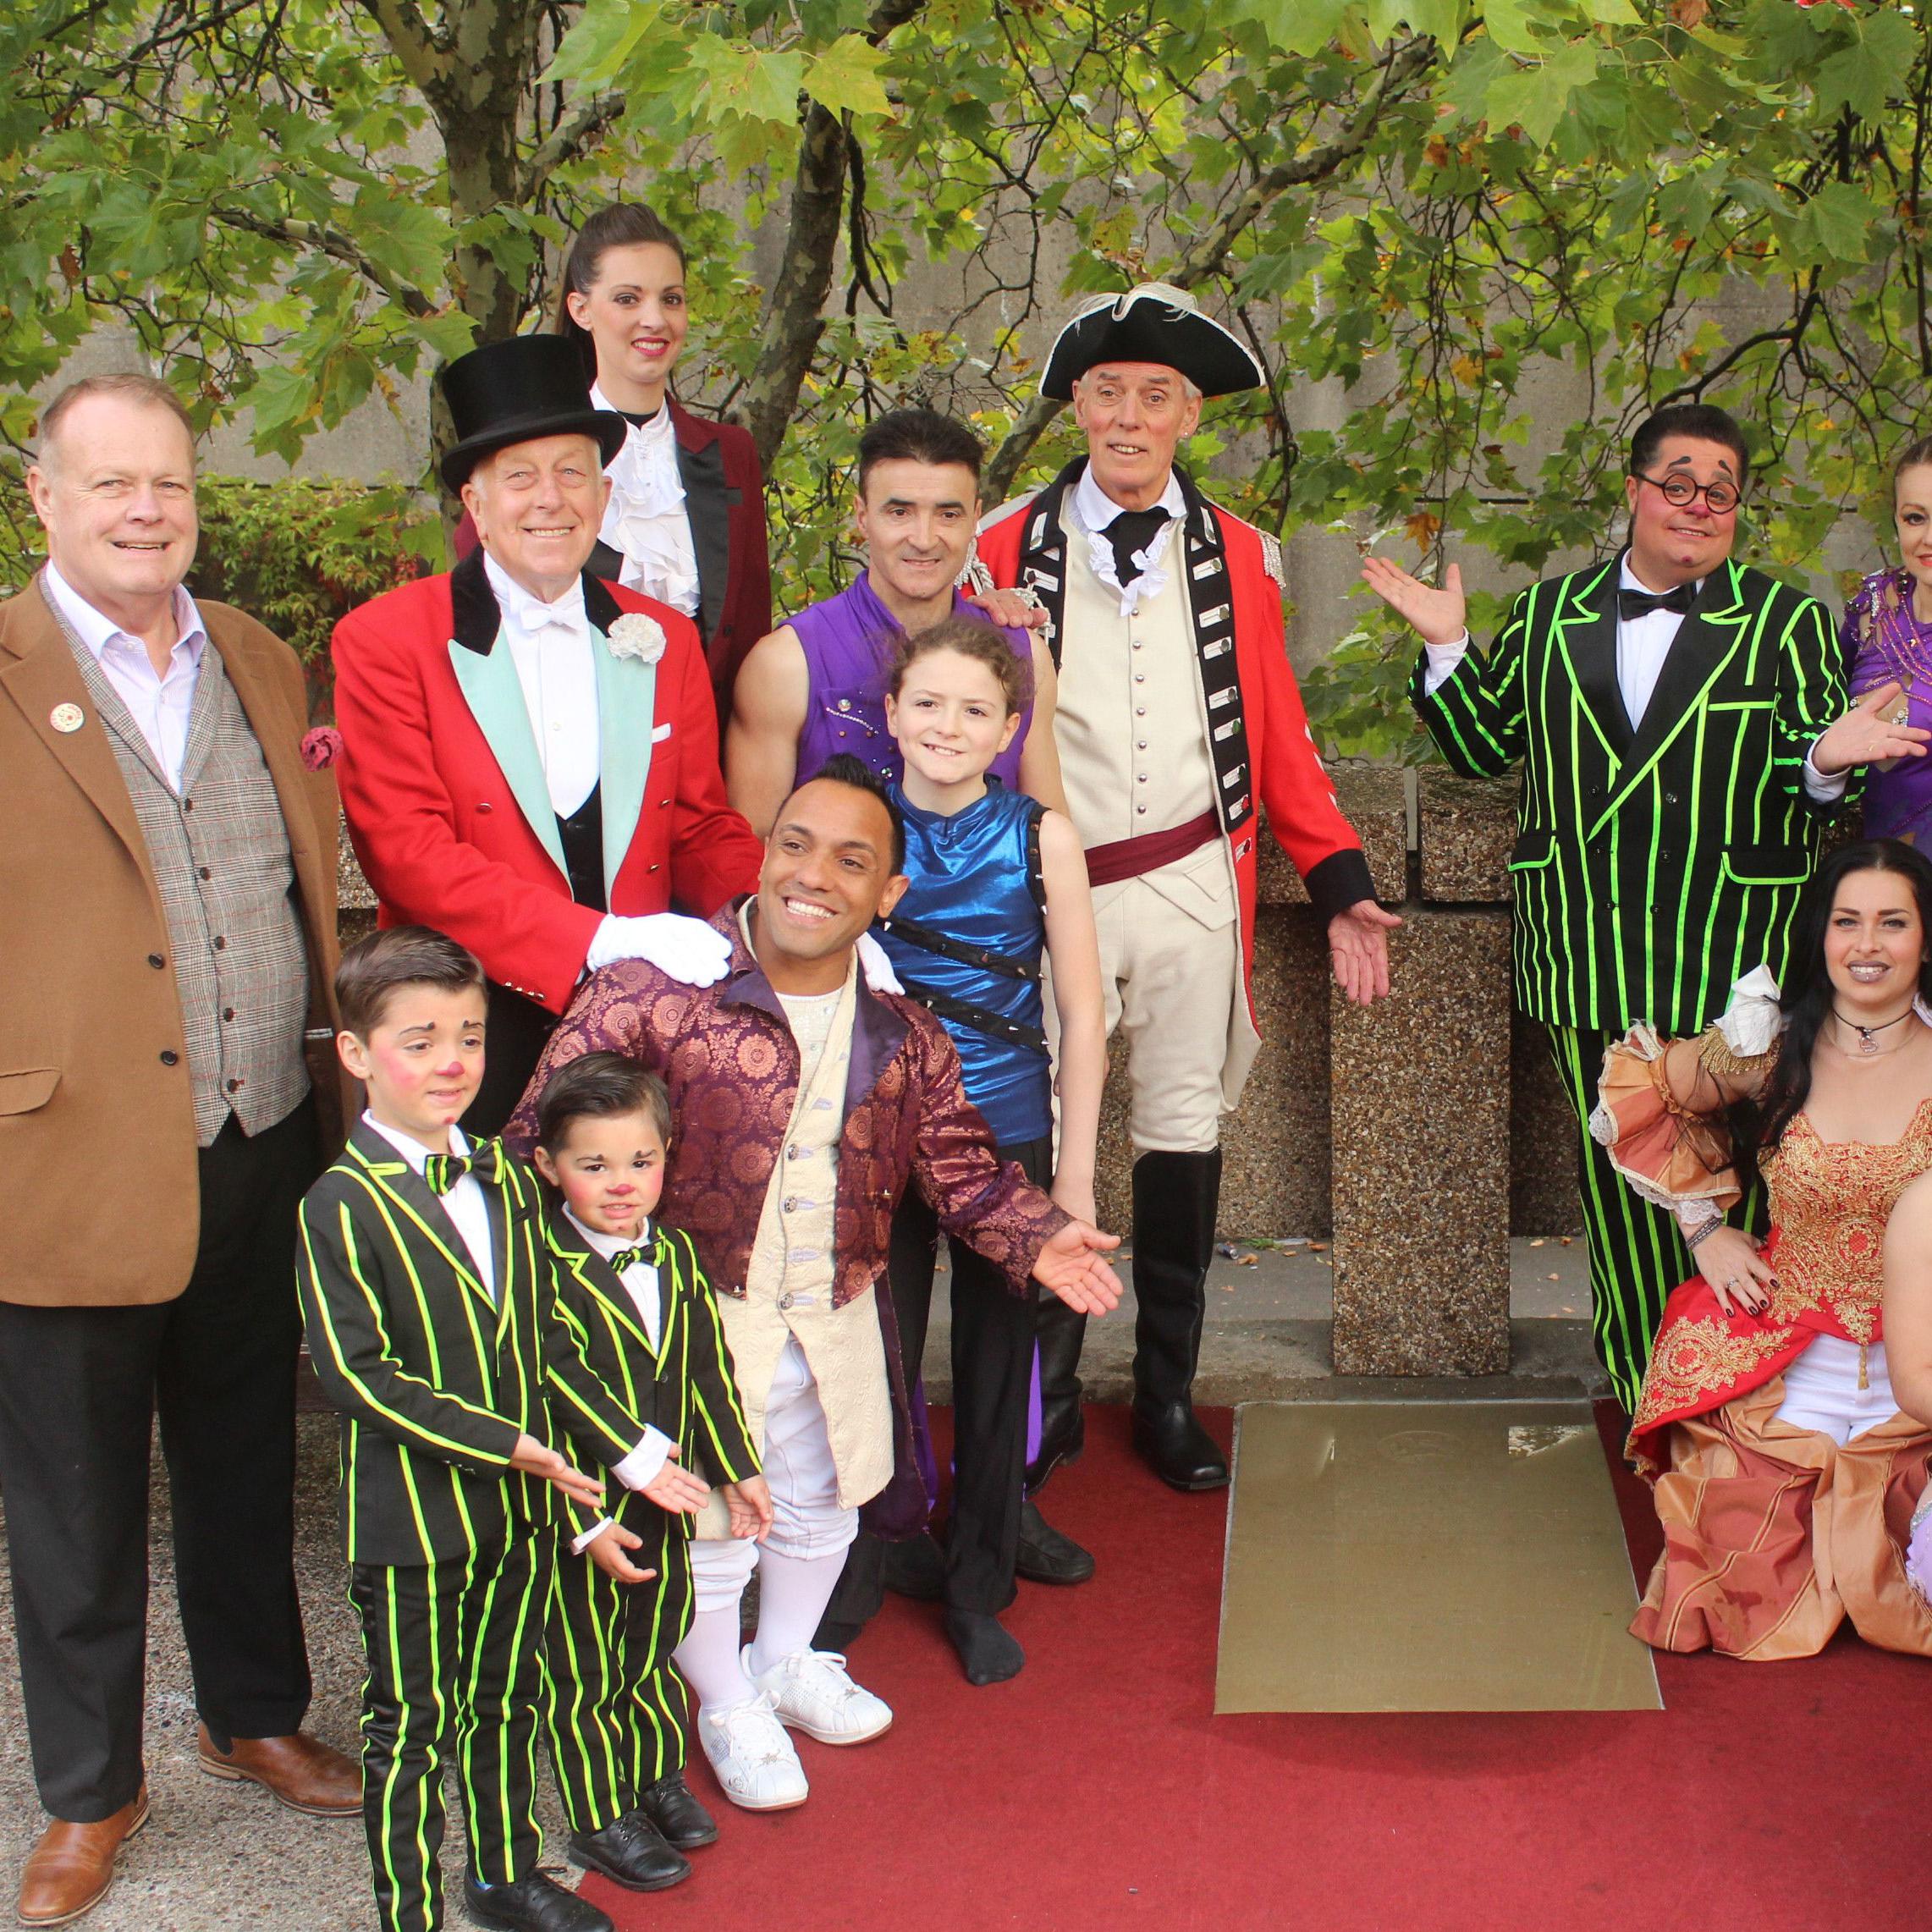 Zippo's Circus lays stone to commemorate Astley's Amphitheatre